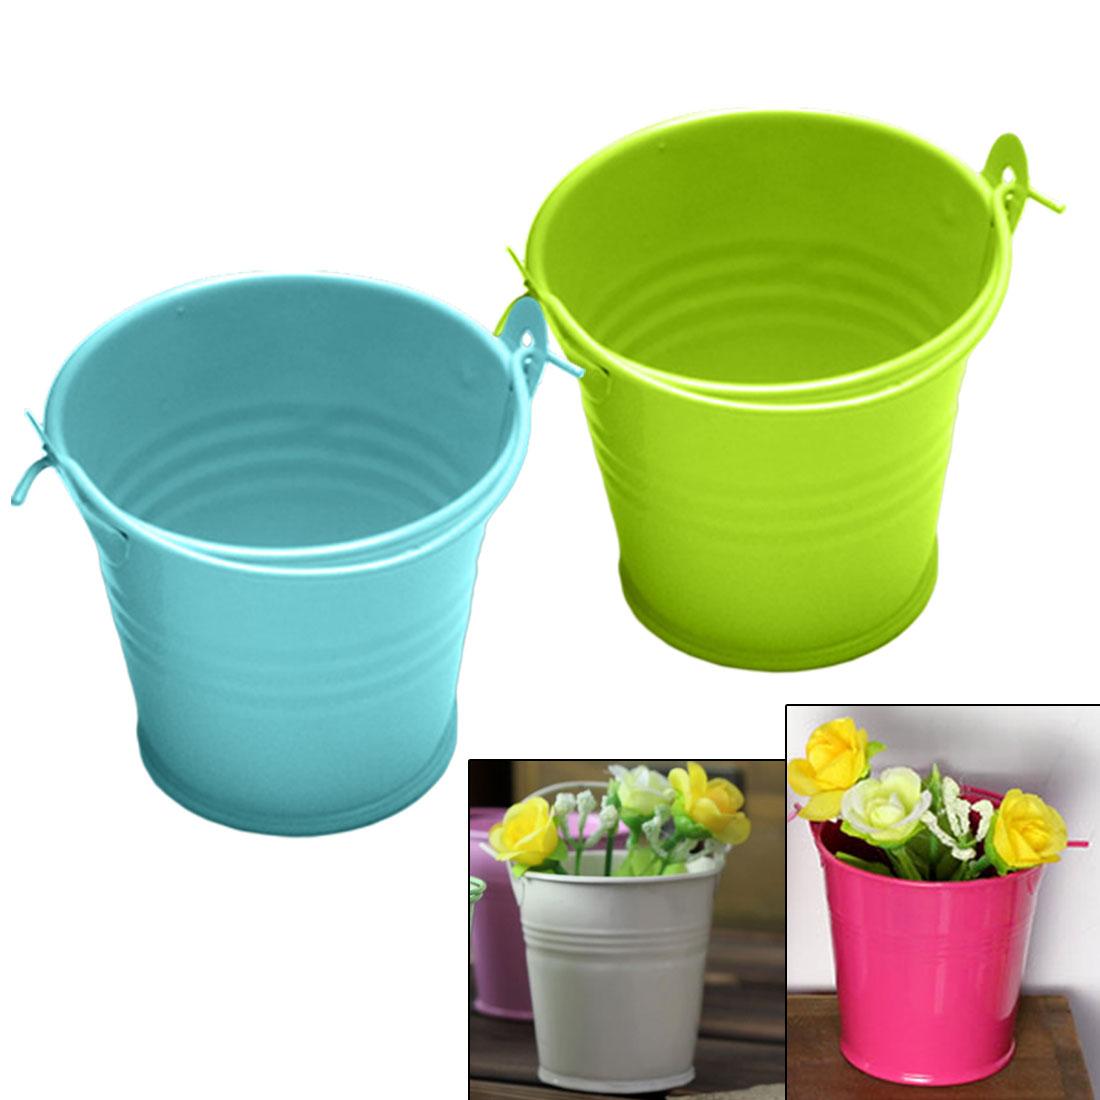 Mini Flower Metal Hanging Pots Garden Balcony Succulent Plant Flowerpot Home Office Decor Iron Bucket With Handle